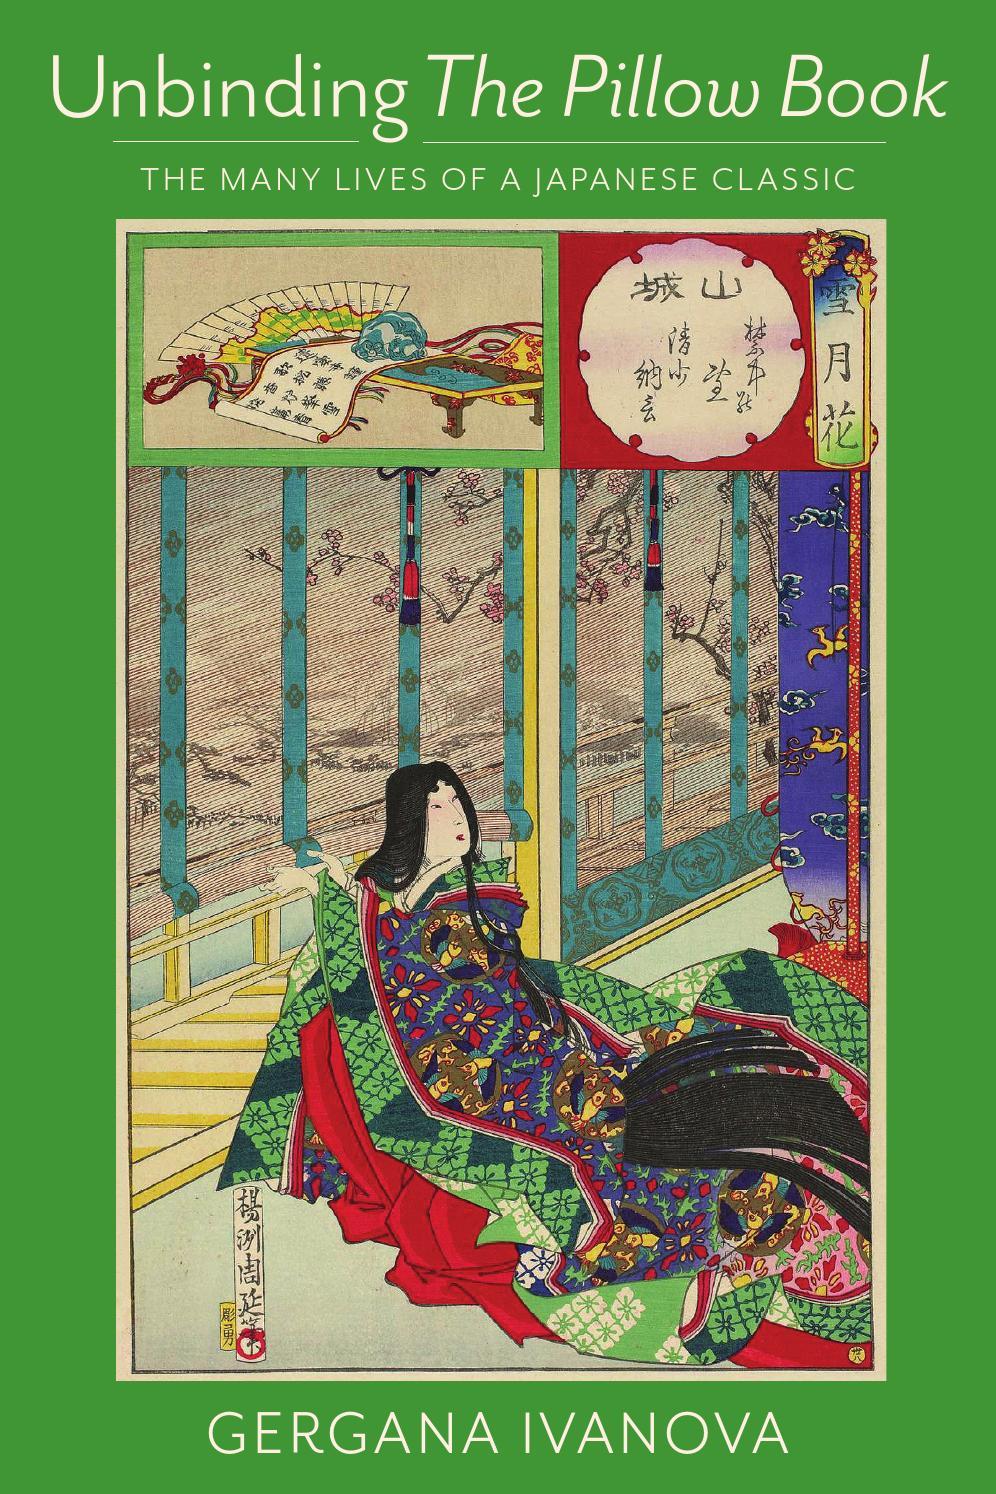 Unbinding The Pillow Book, by Gergana Ivanova (chapter 1) by Columbia  University Press - issuu